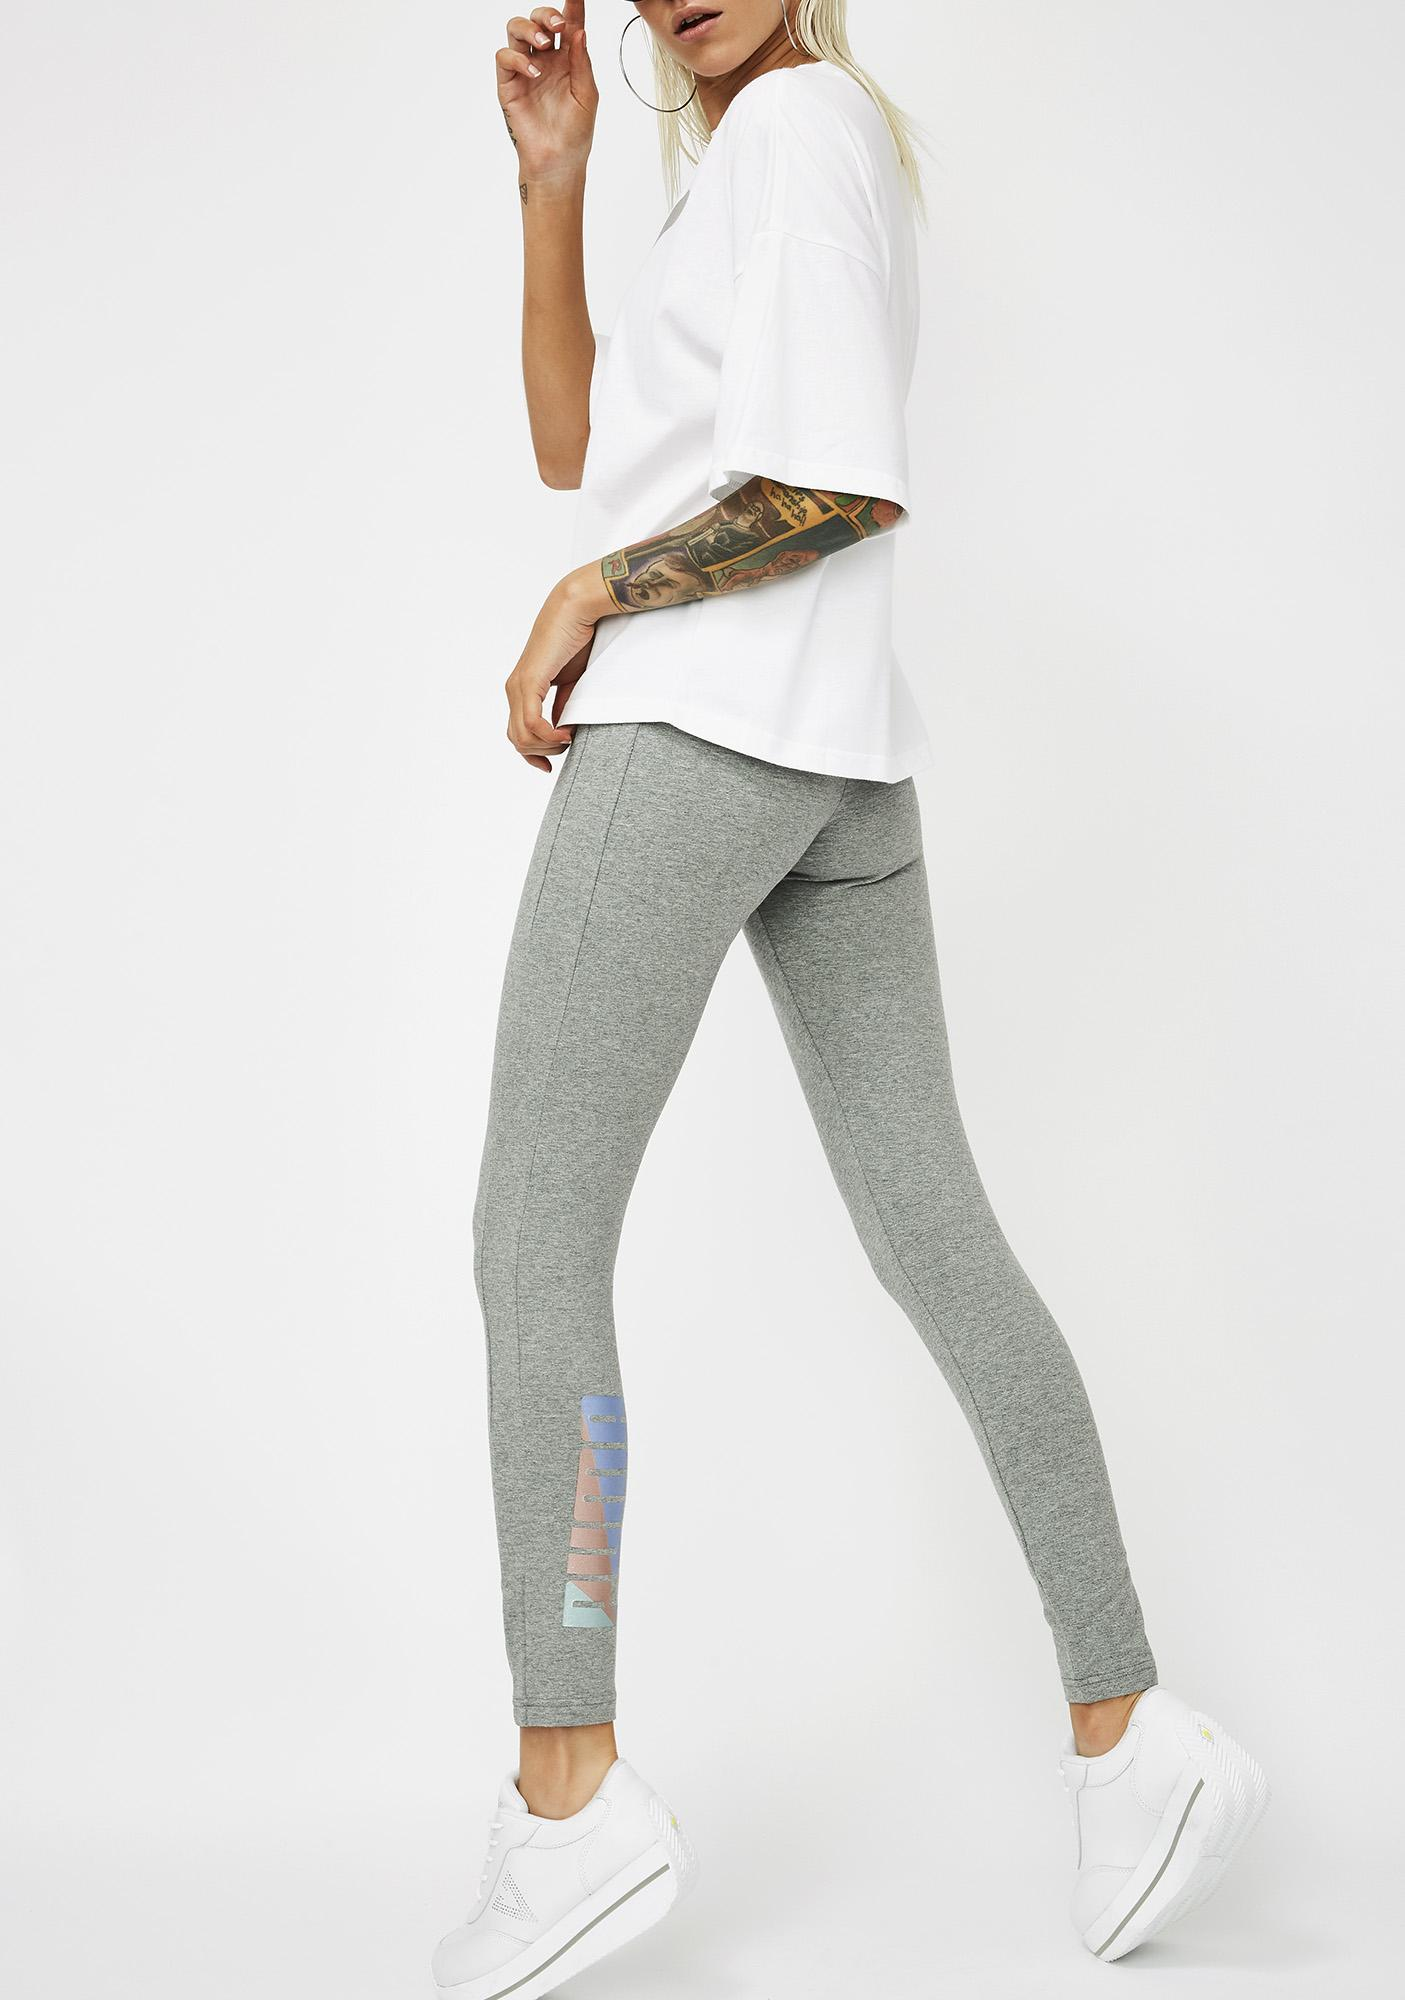 PUMA Heather Glam Leggings